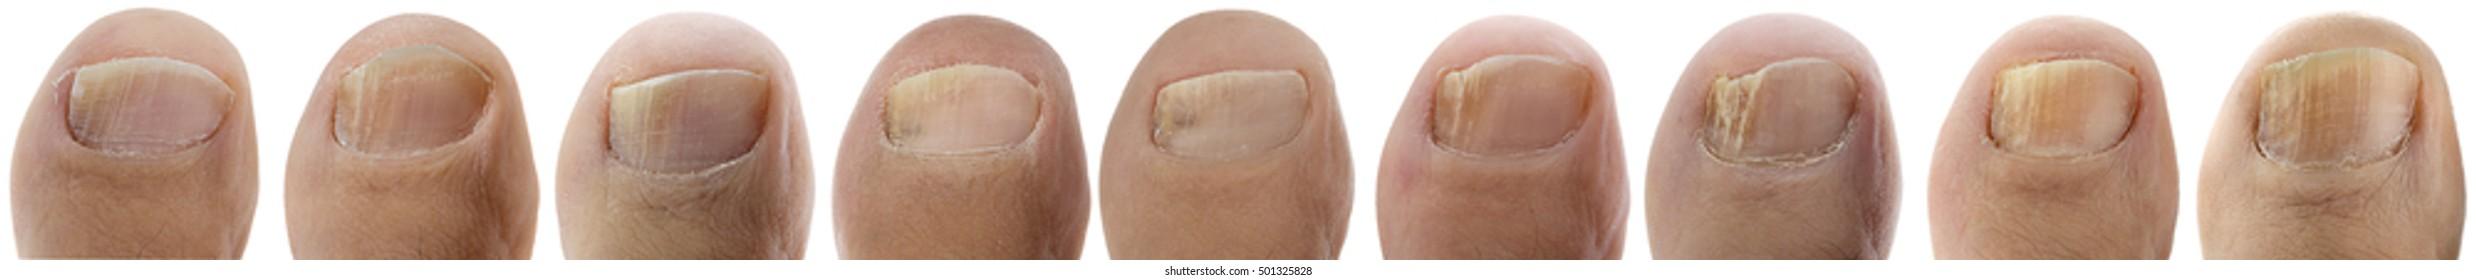 Toenail Fungus Images, Stock Photos & Vectors   Shutterstock